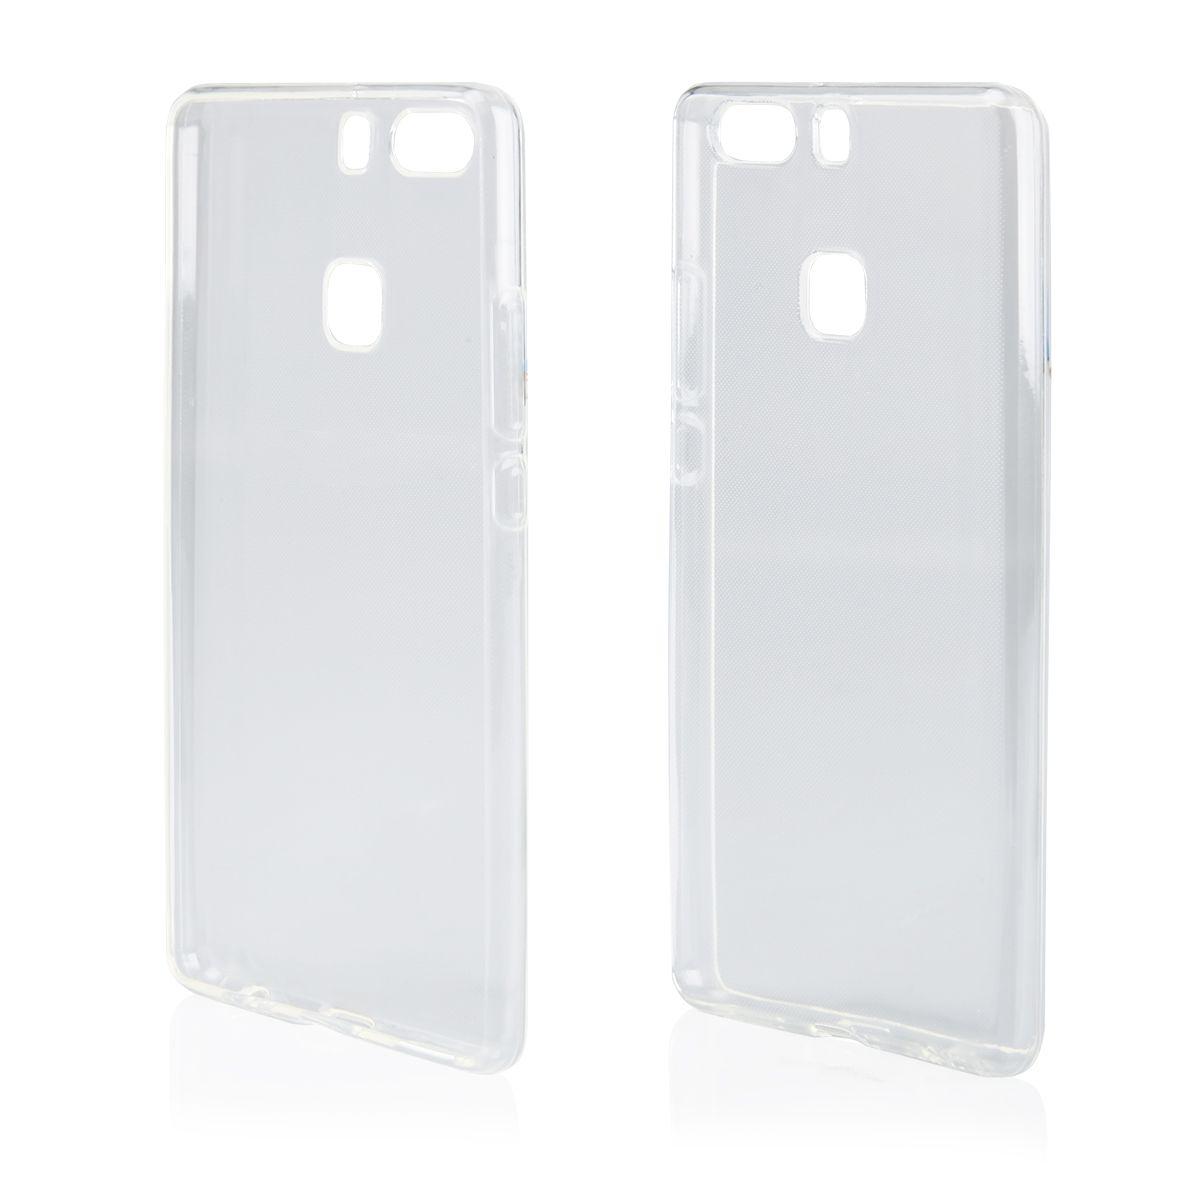 Pouzdro Jelly Case na Huawei P Smart - 0,5mm - čiré